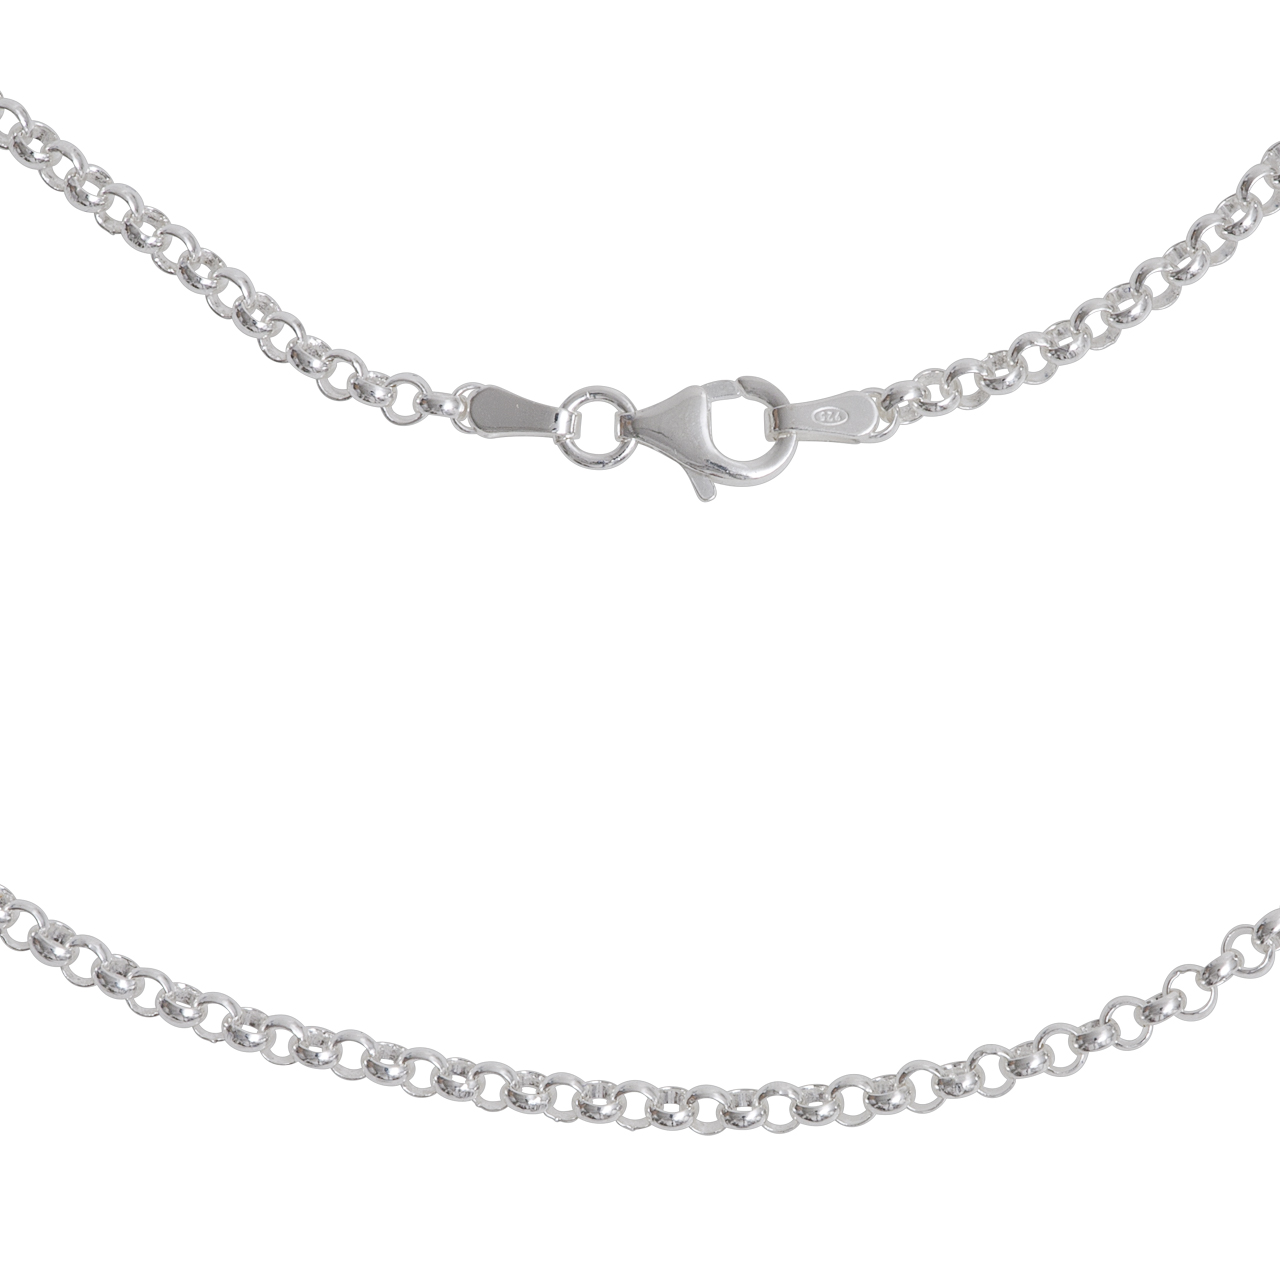 Silber-Kette, 45cm